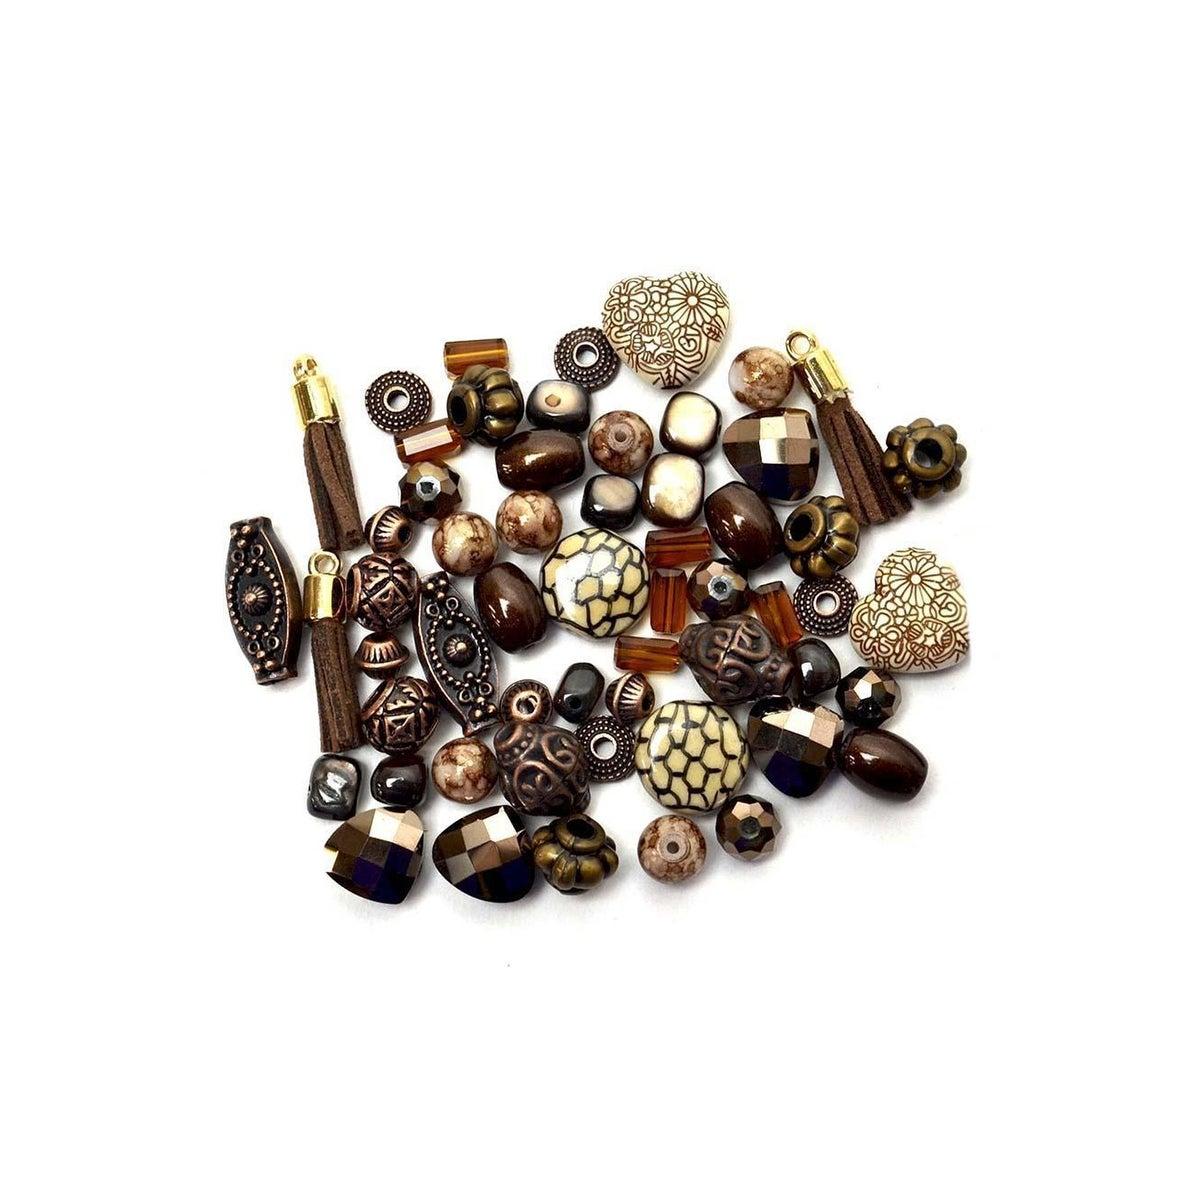 Jesse James Beads White Label Collection Stargazer Bead Strand